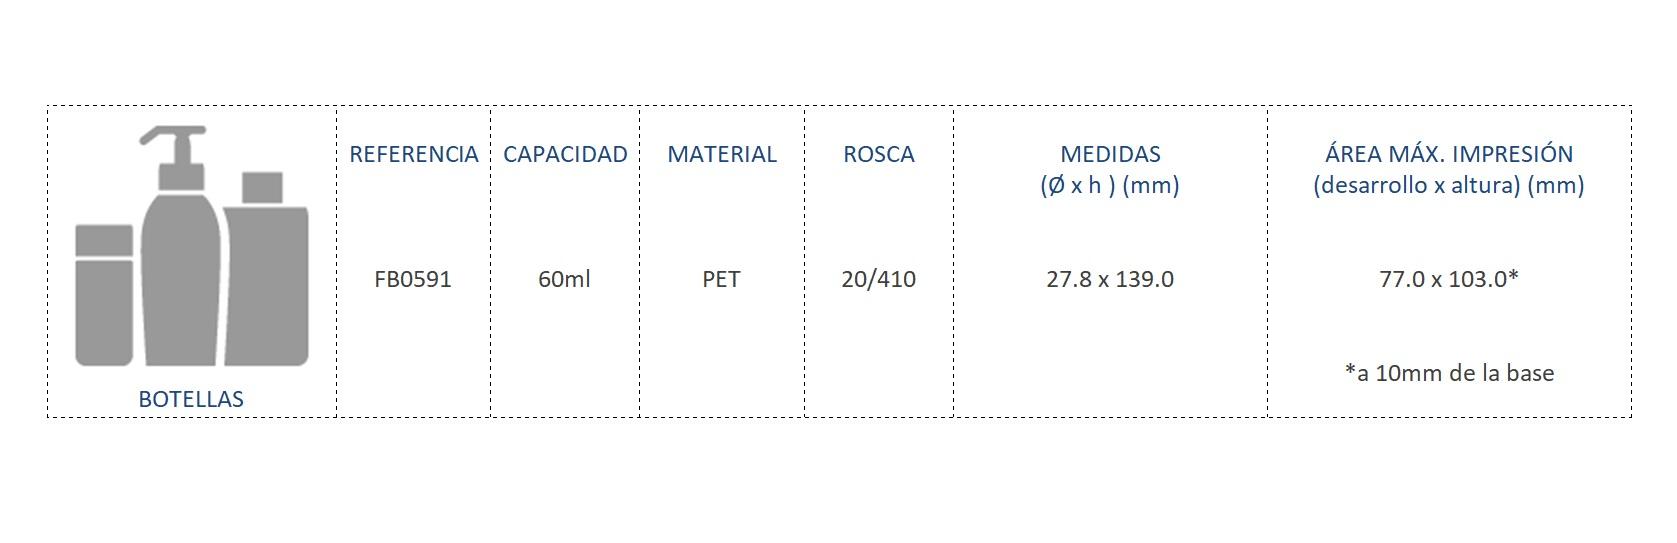 Cuadro de materiales FB0591